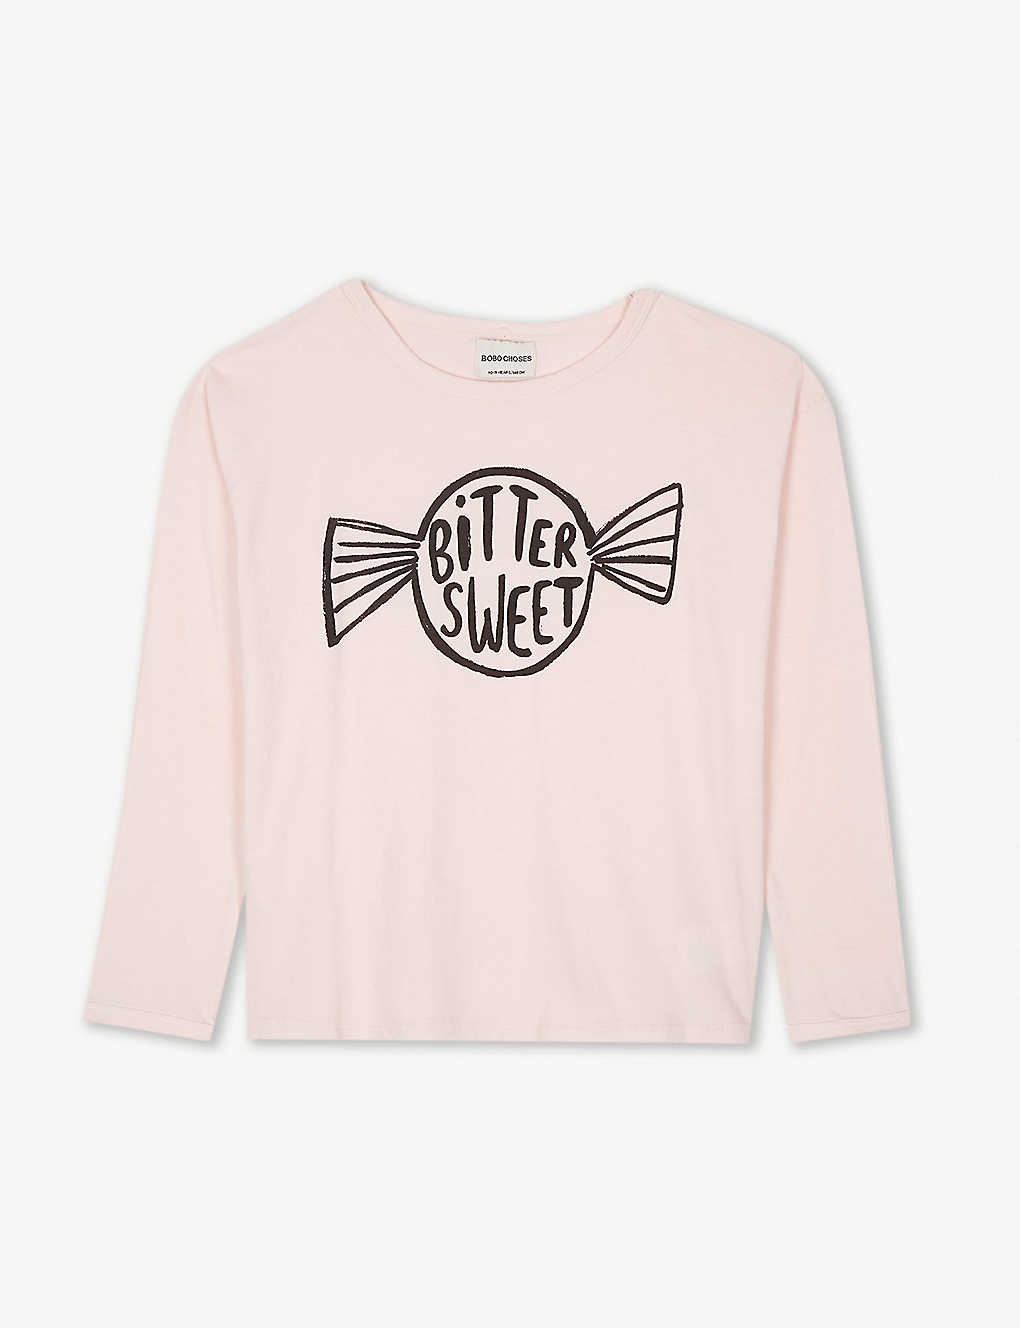 94fb2518 BOBO CHOSES - Bitter Sweet cotton T-shirt 4-11 years | Selfridges.com